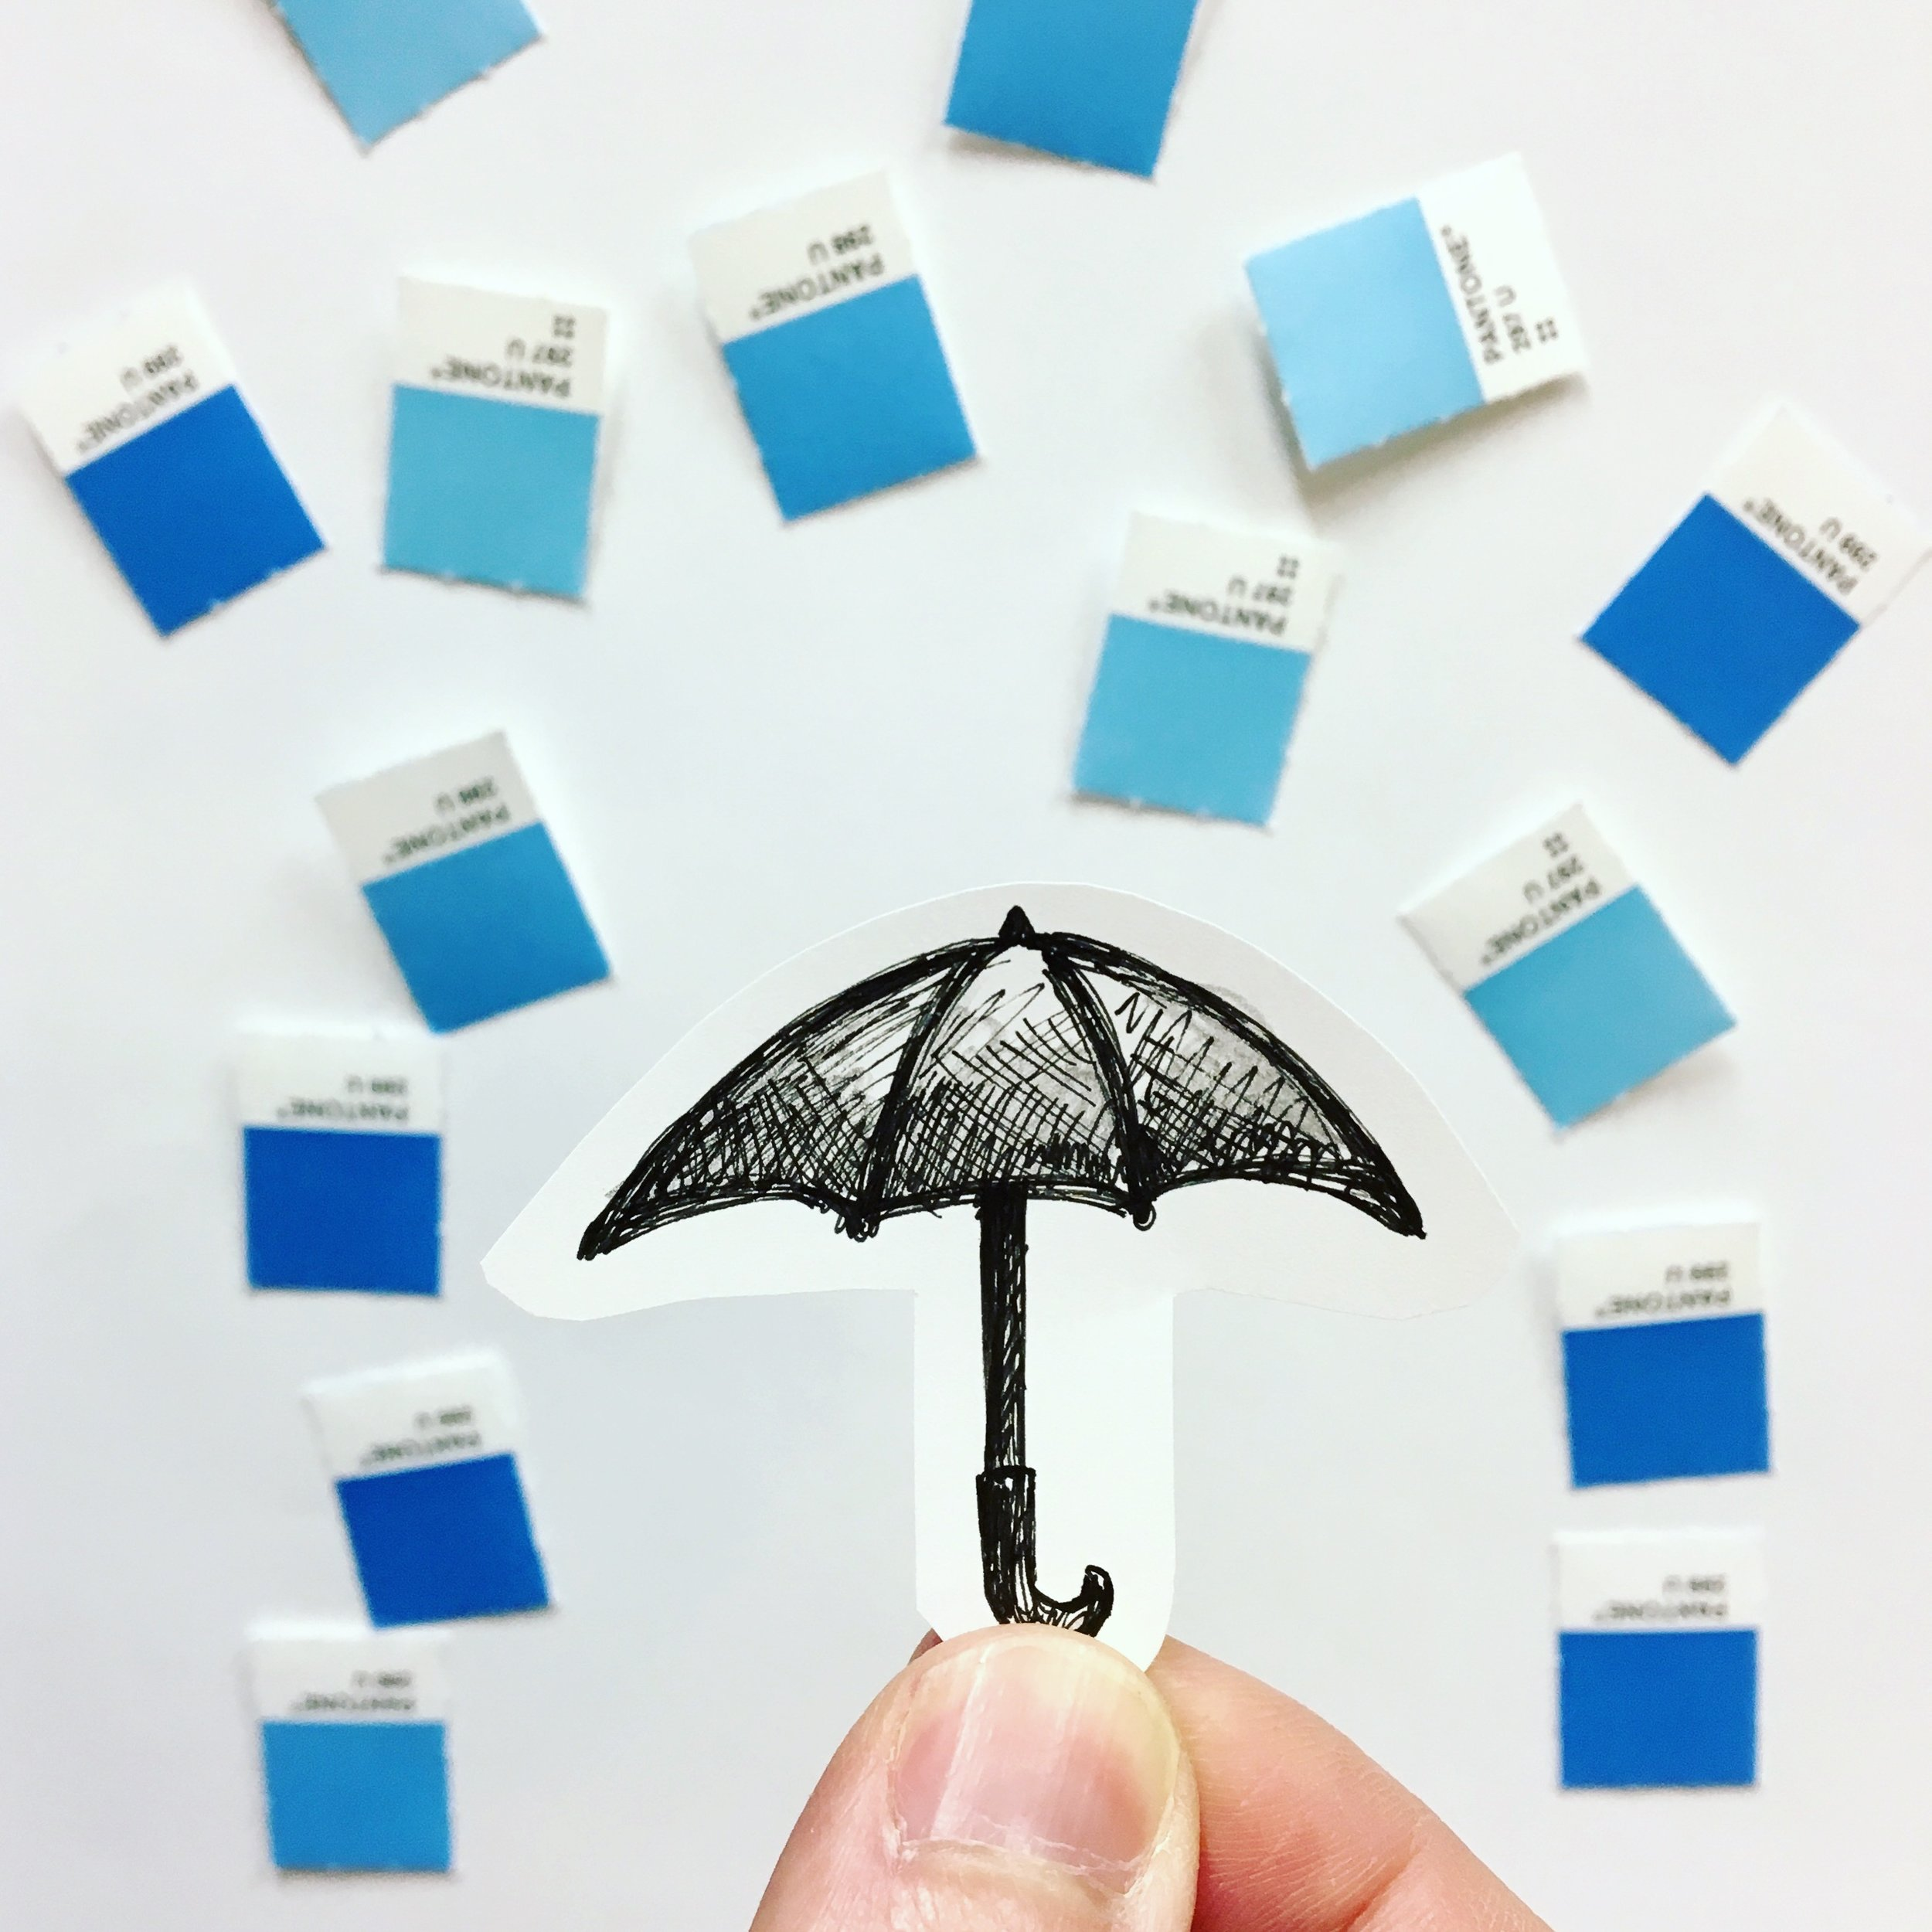 jordan-fretz-art-pantone-umbrella-interactive-illustration.jpg